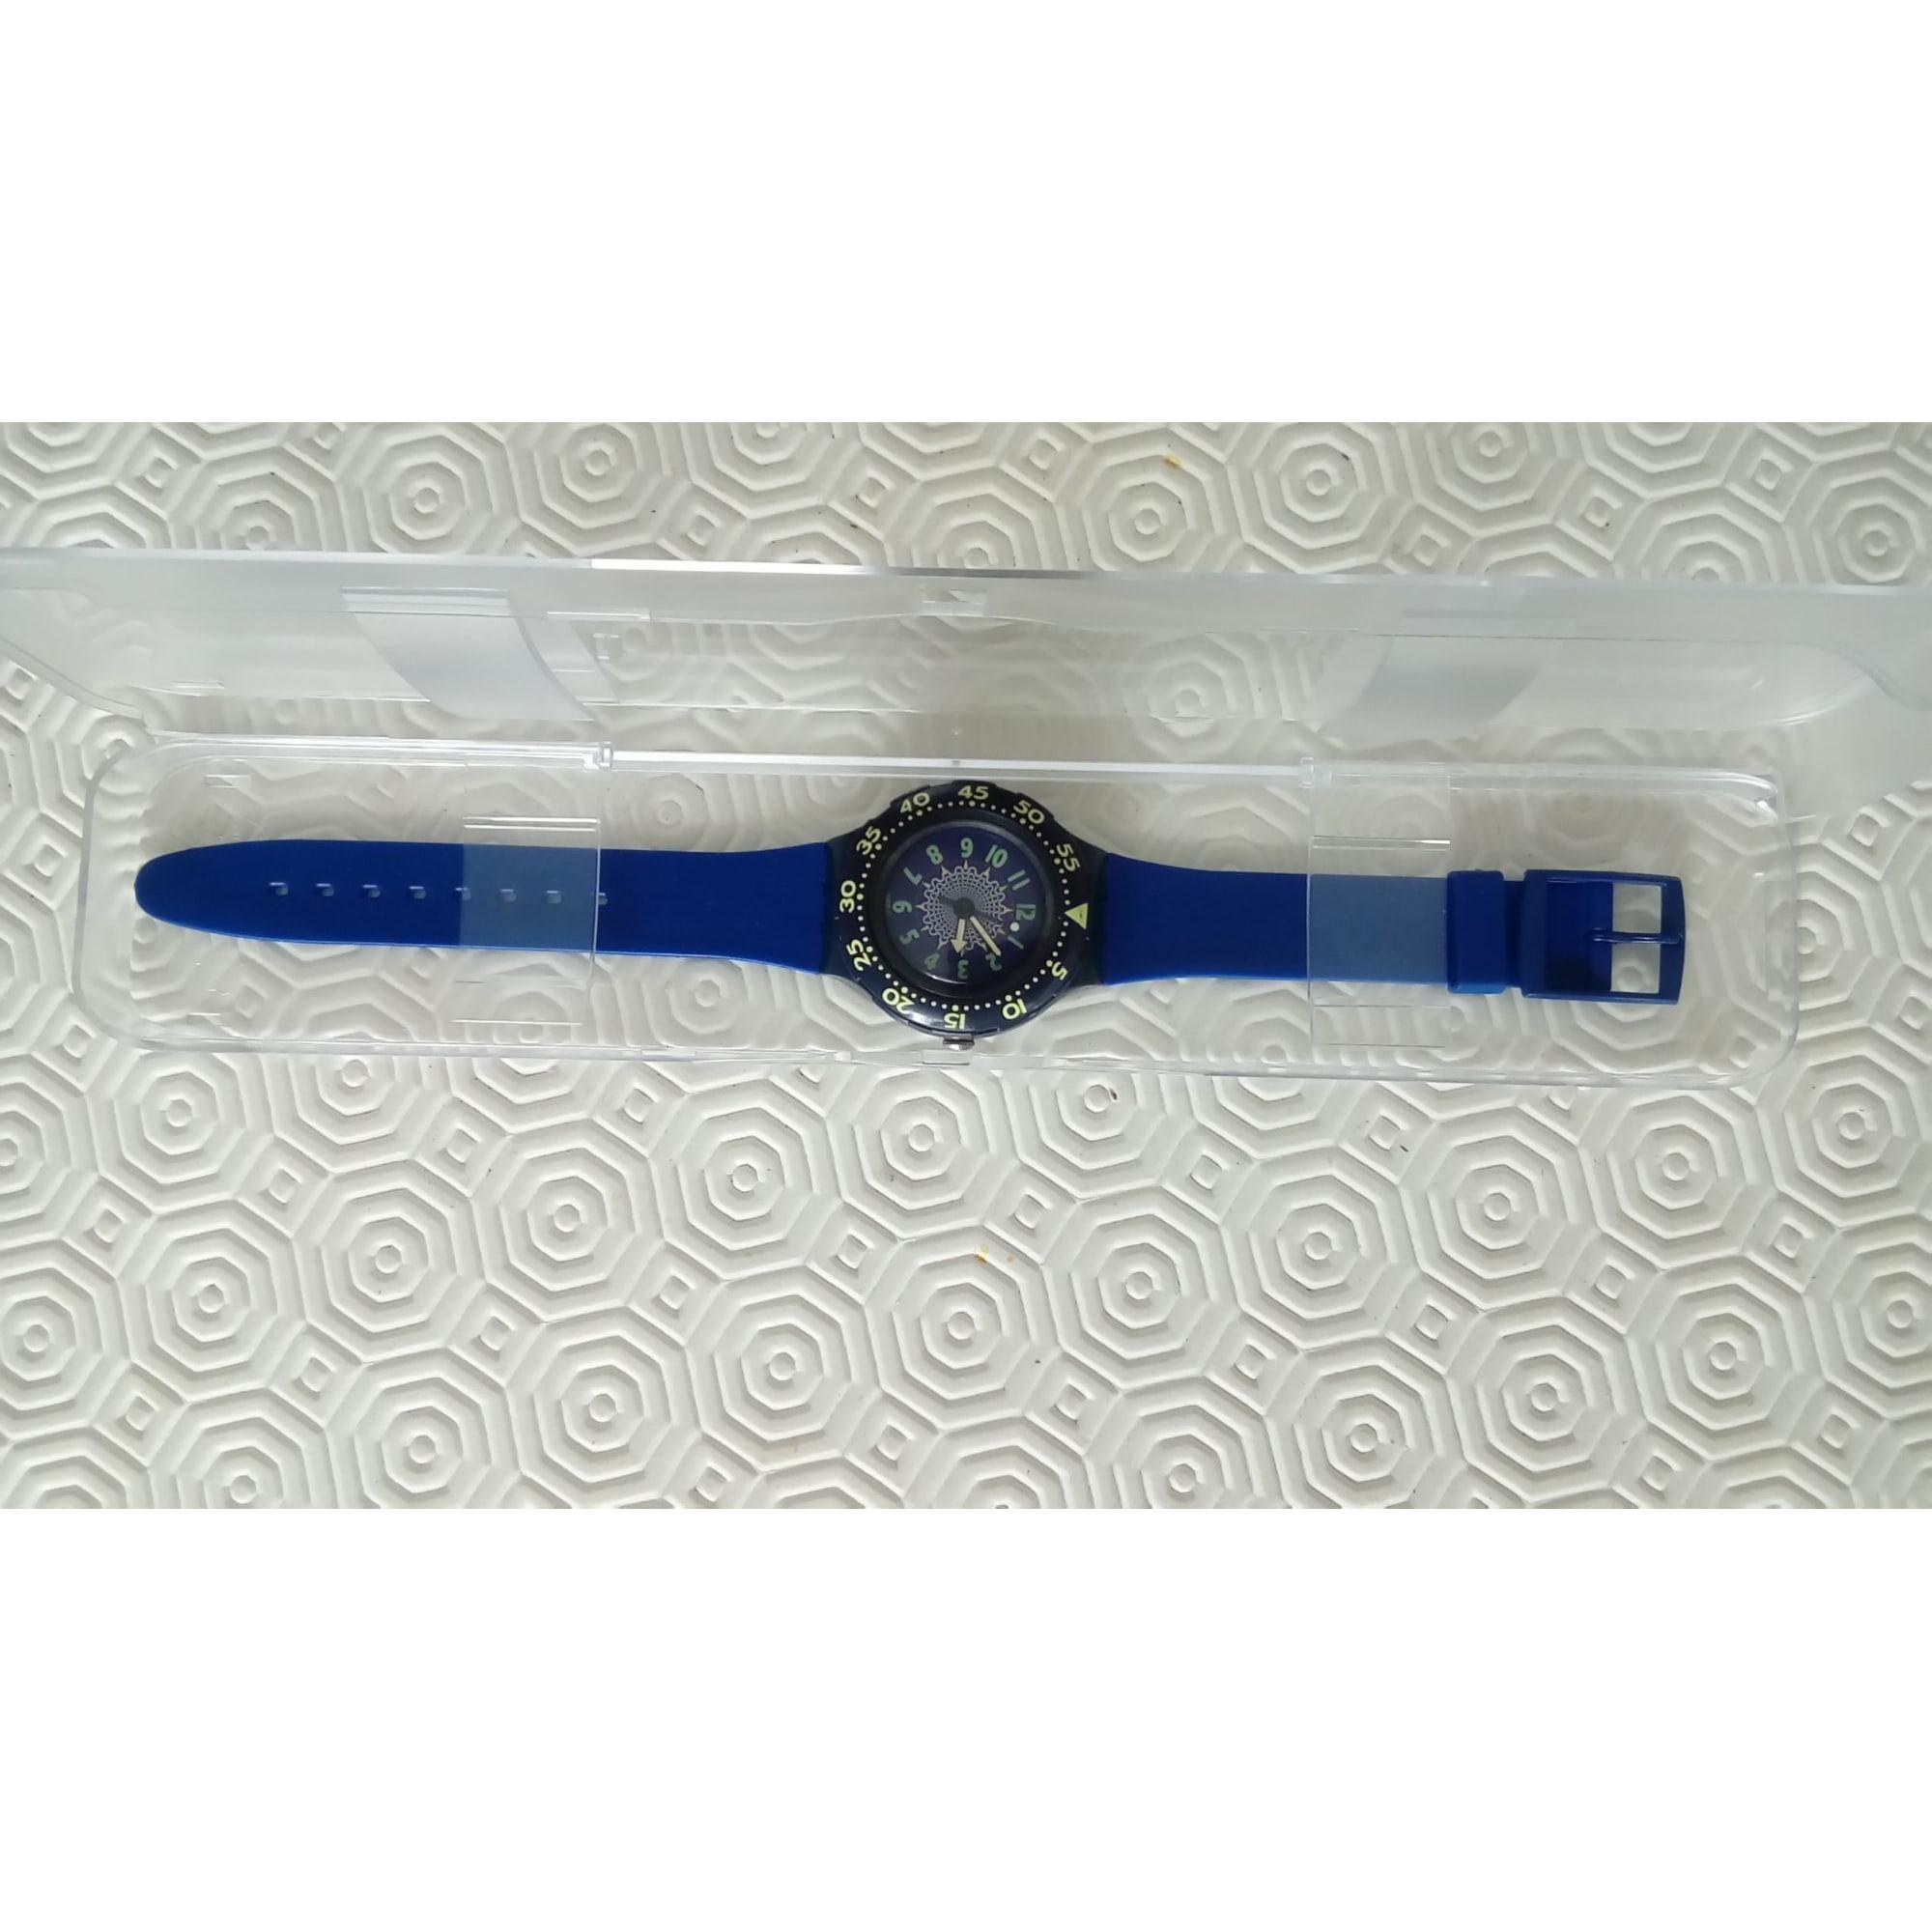 Montre au poignet SWATCH Bleu, bleu marine, bleu turquoise